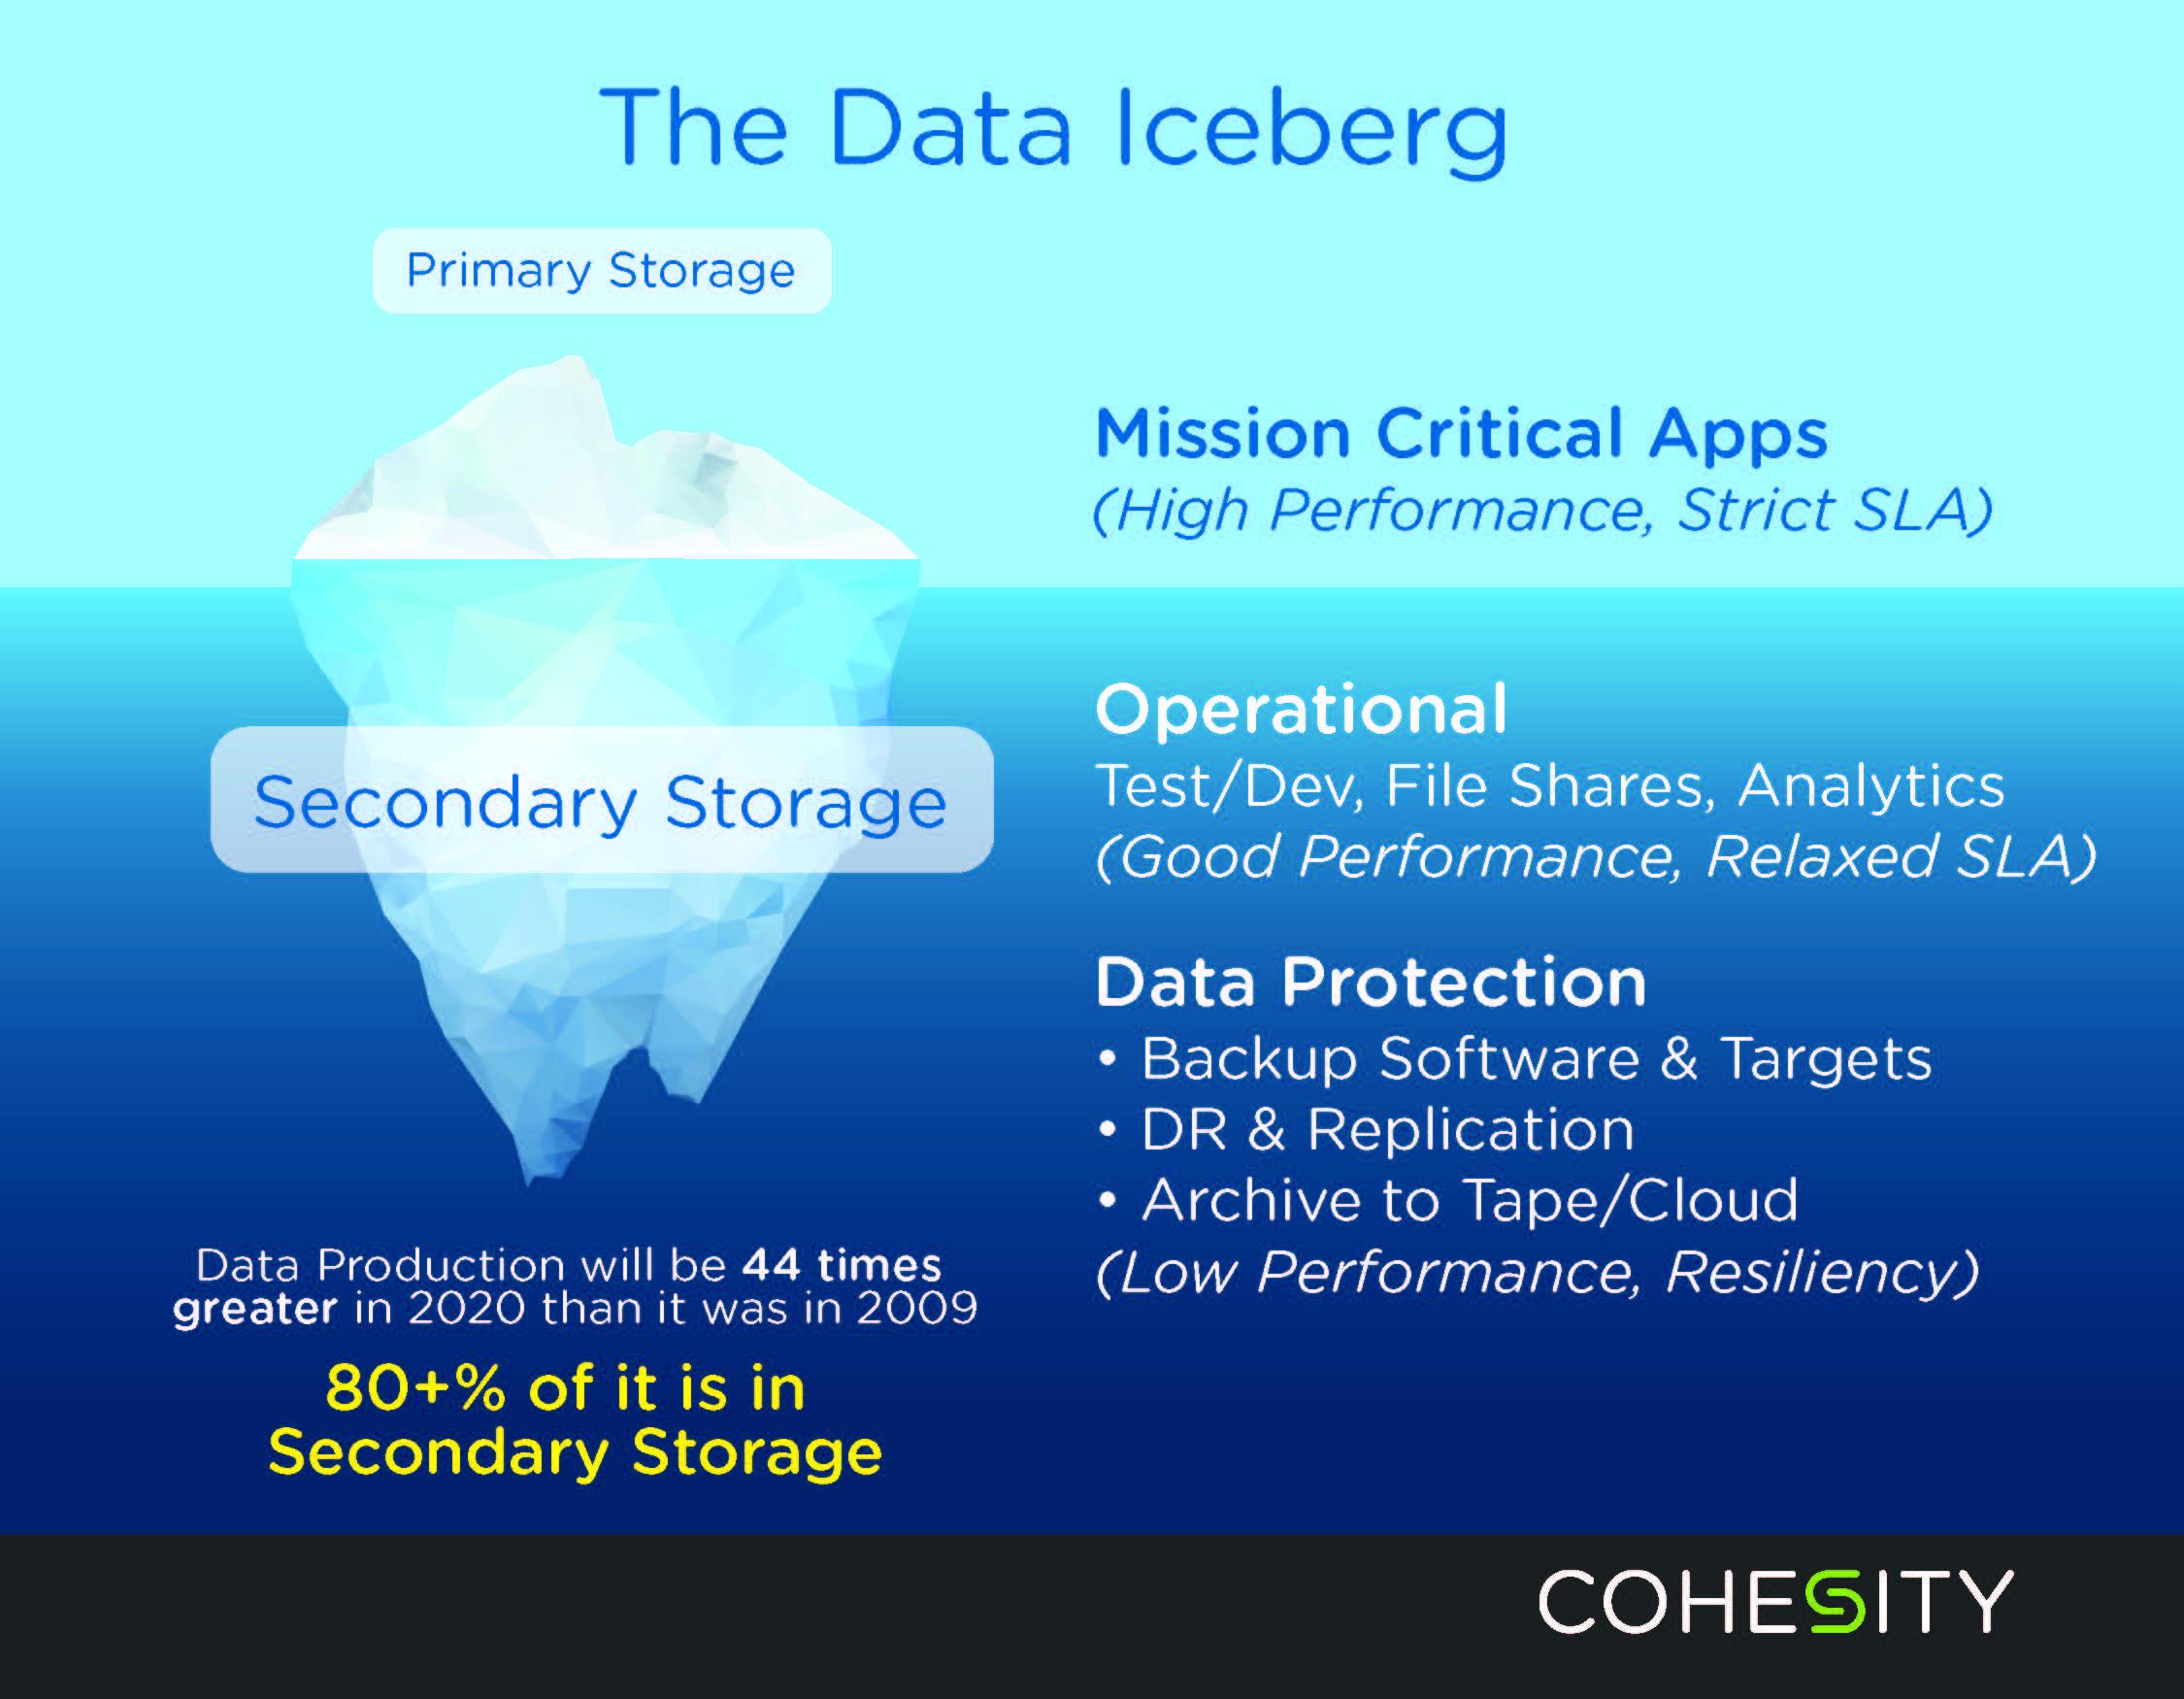 Cohesity_Iceberg